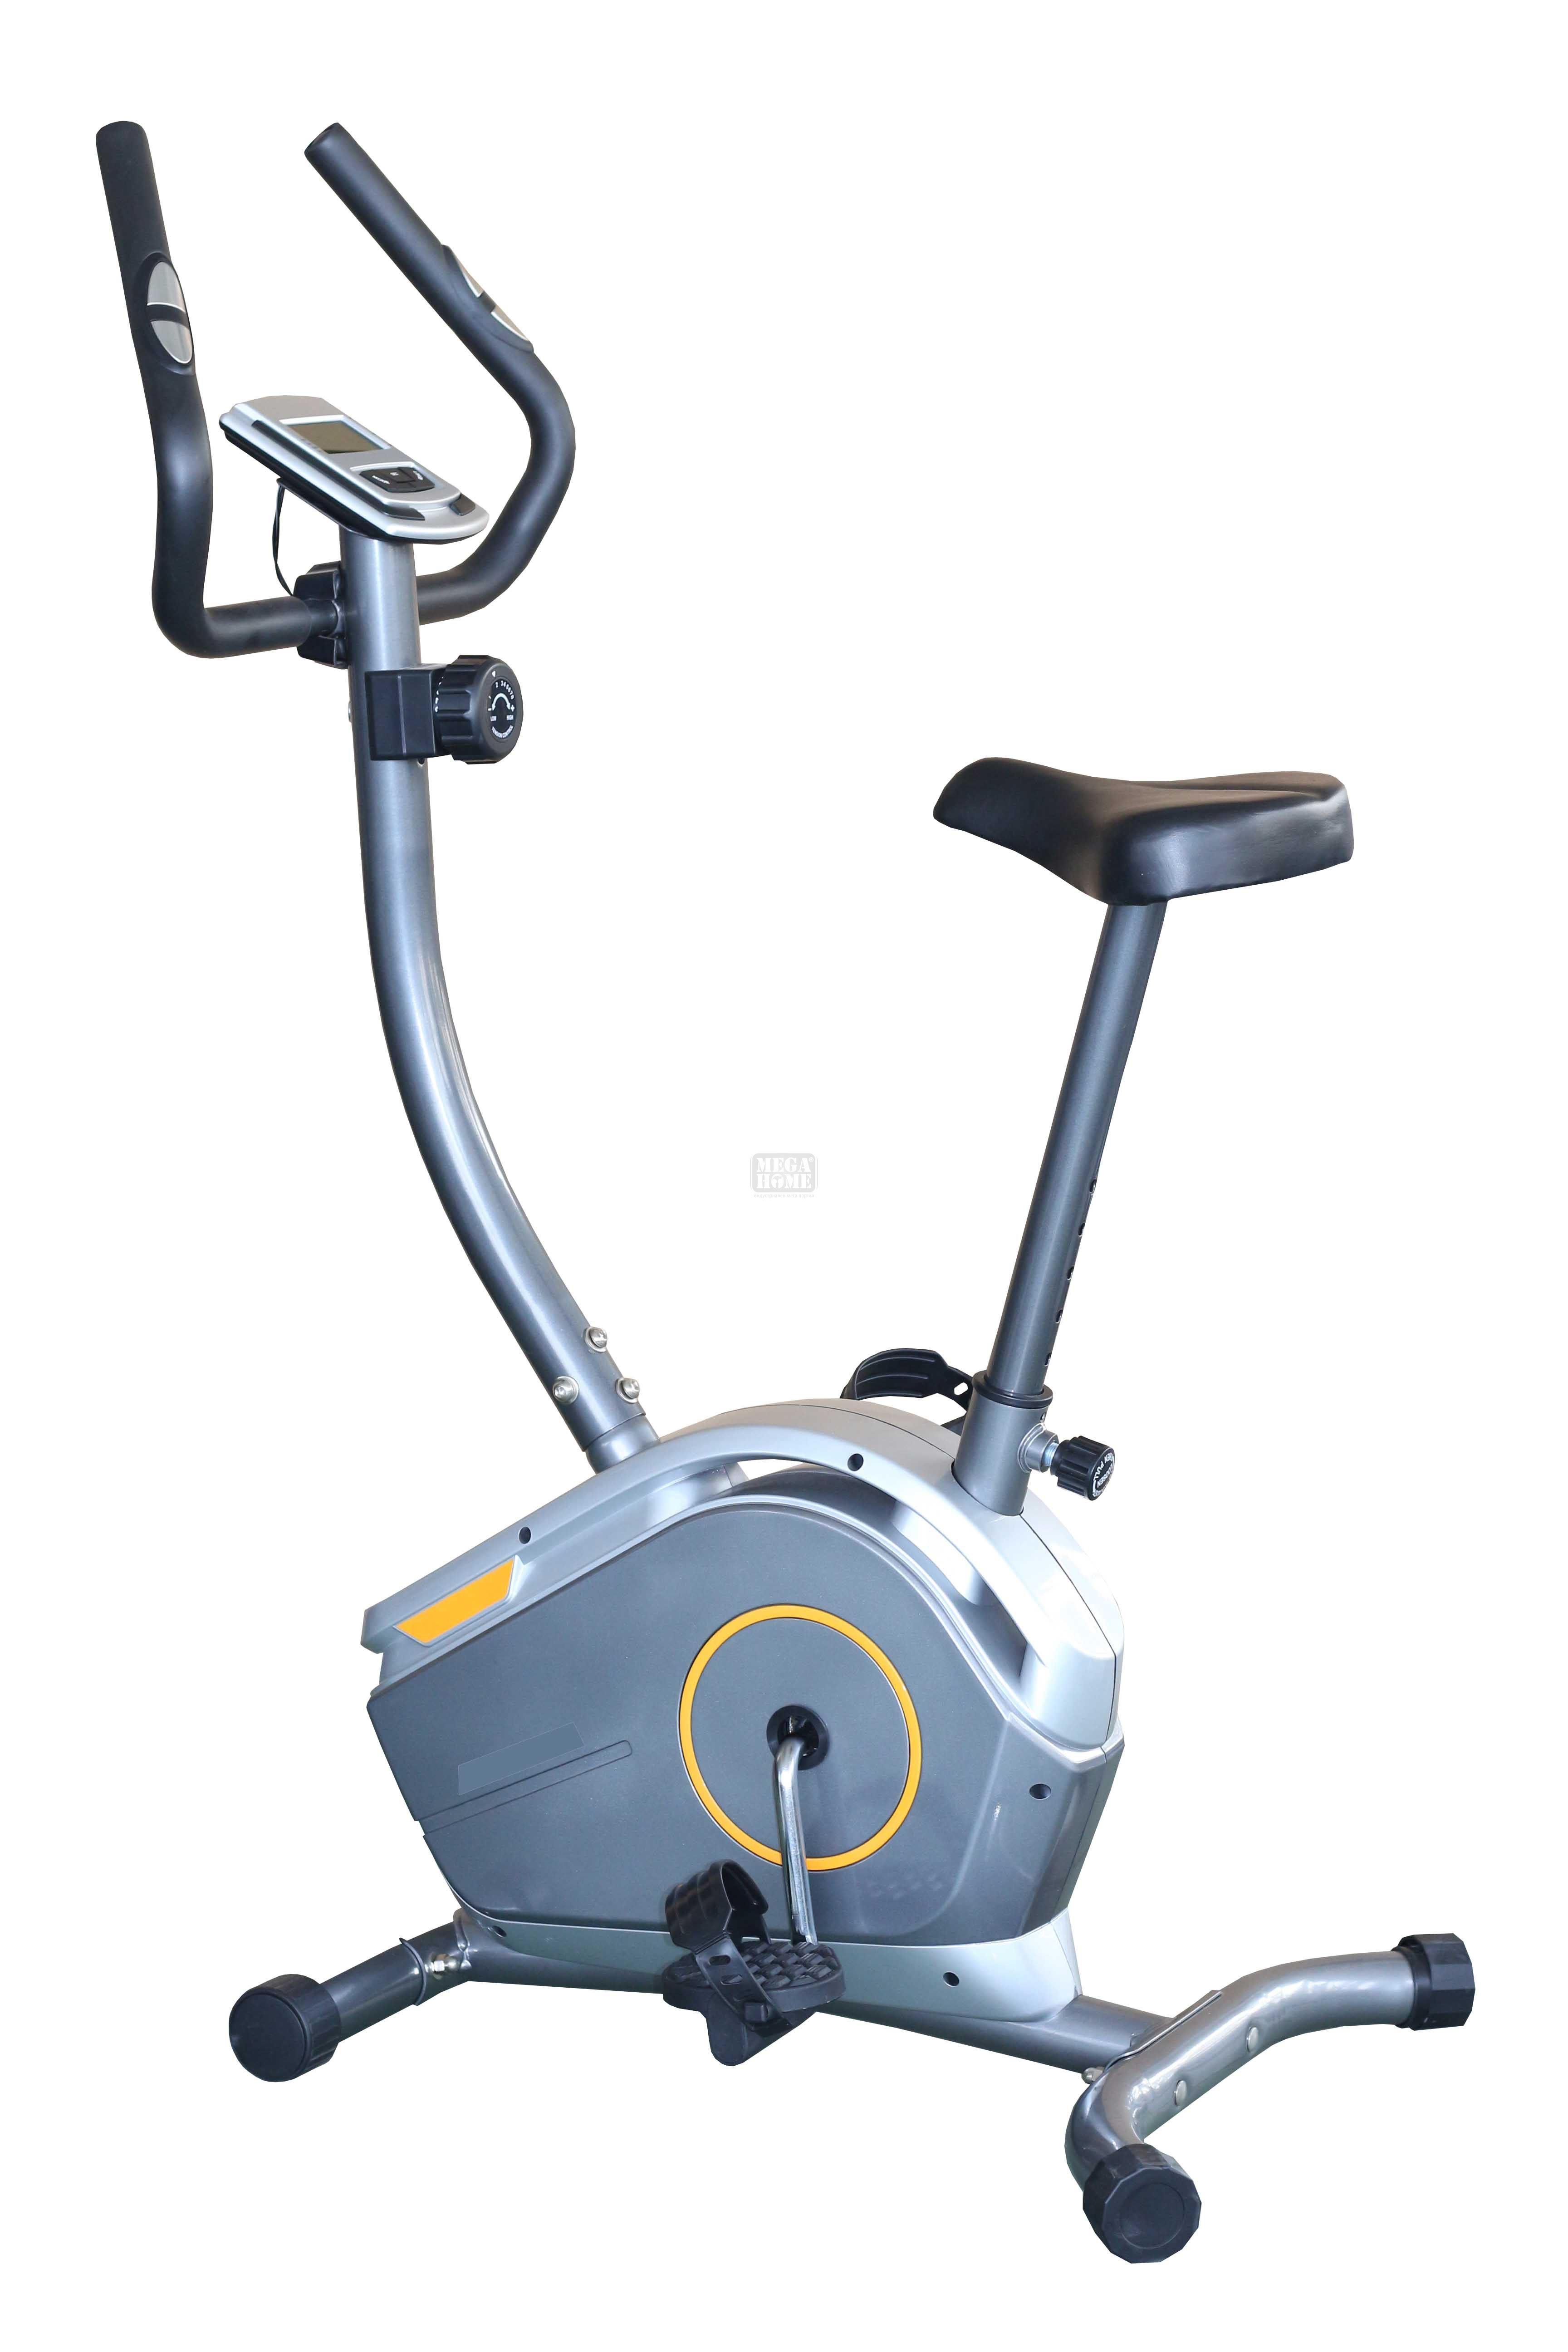 05feabdf449 Велоергометър TS 2280 Top Sport - Фитнес колело до 120 кг - Цена ...